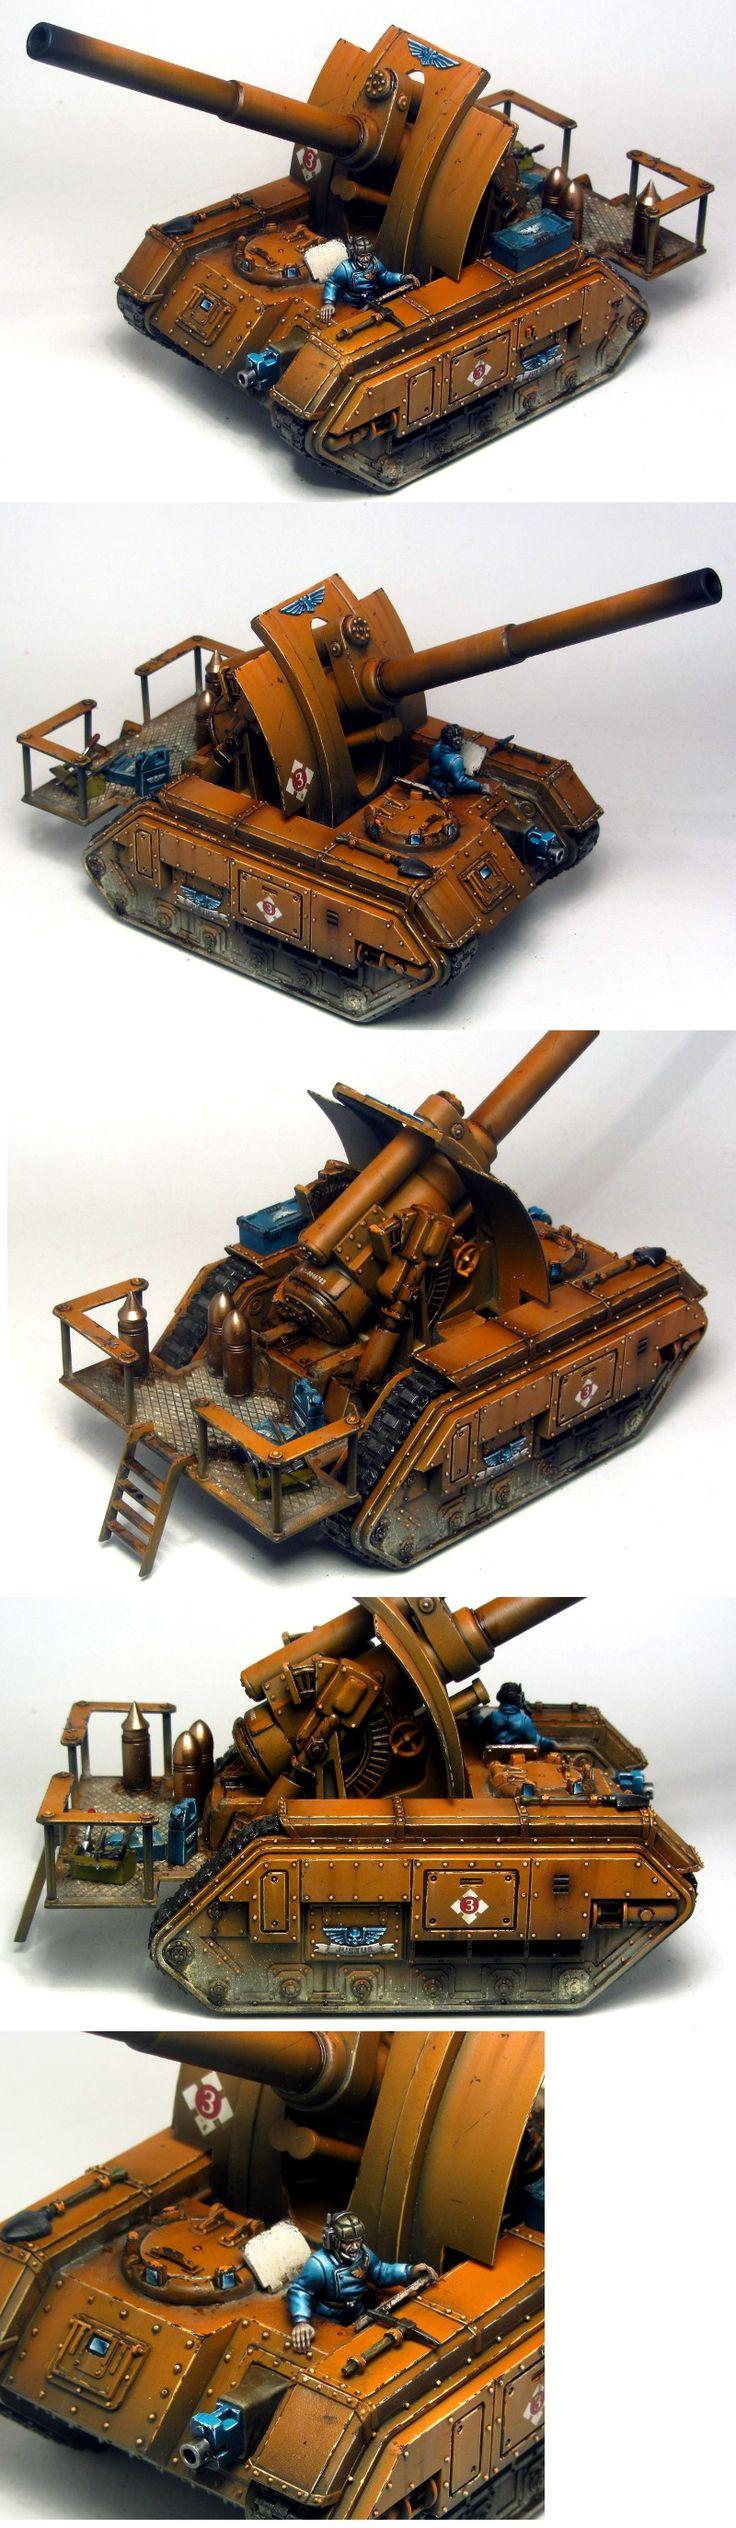 40k - Imperial Guard Basilisk Artillery Tank